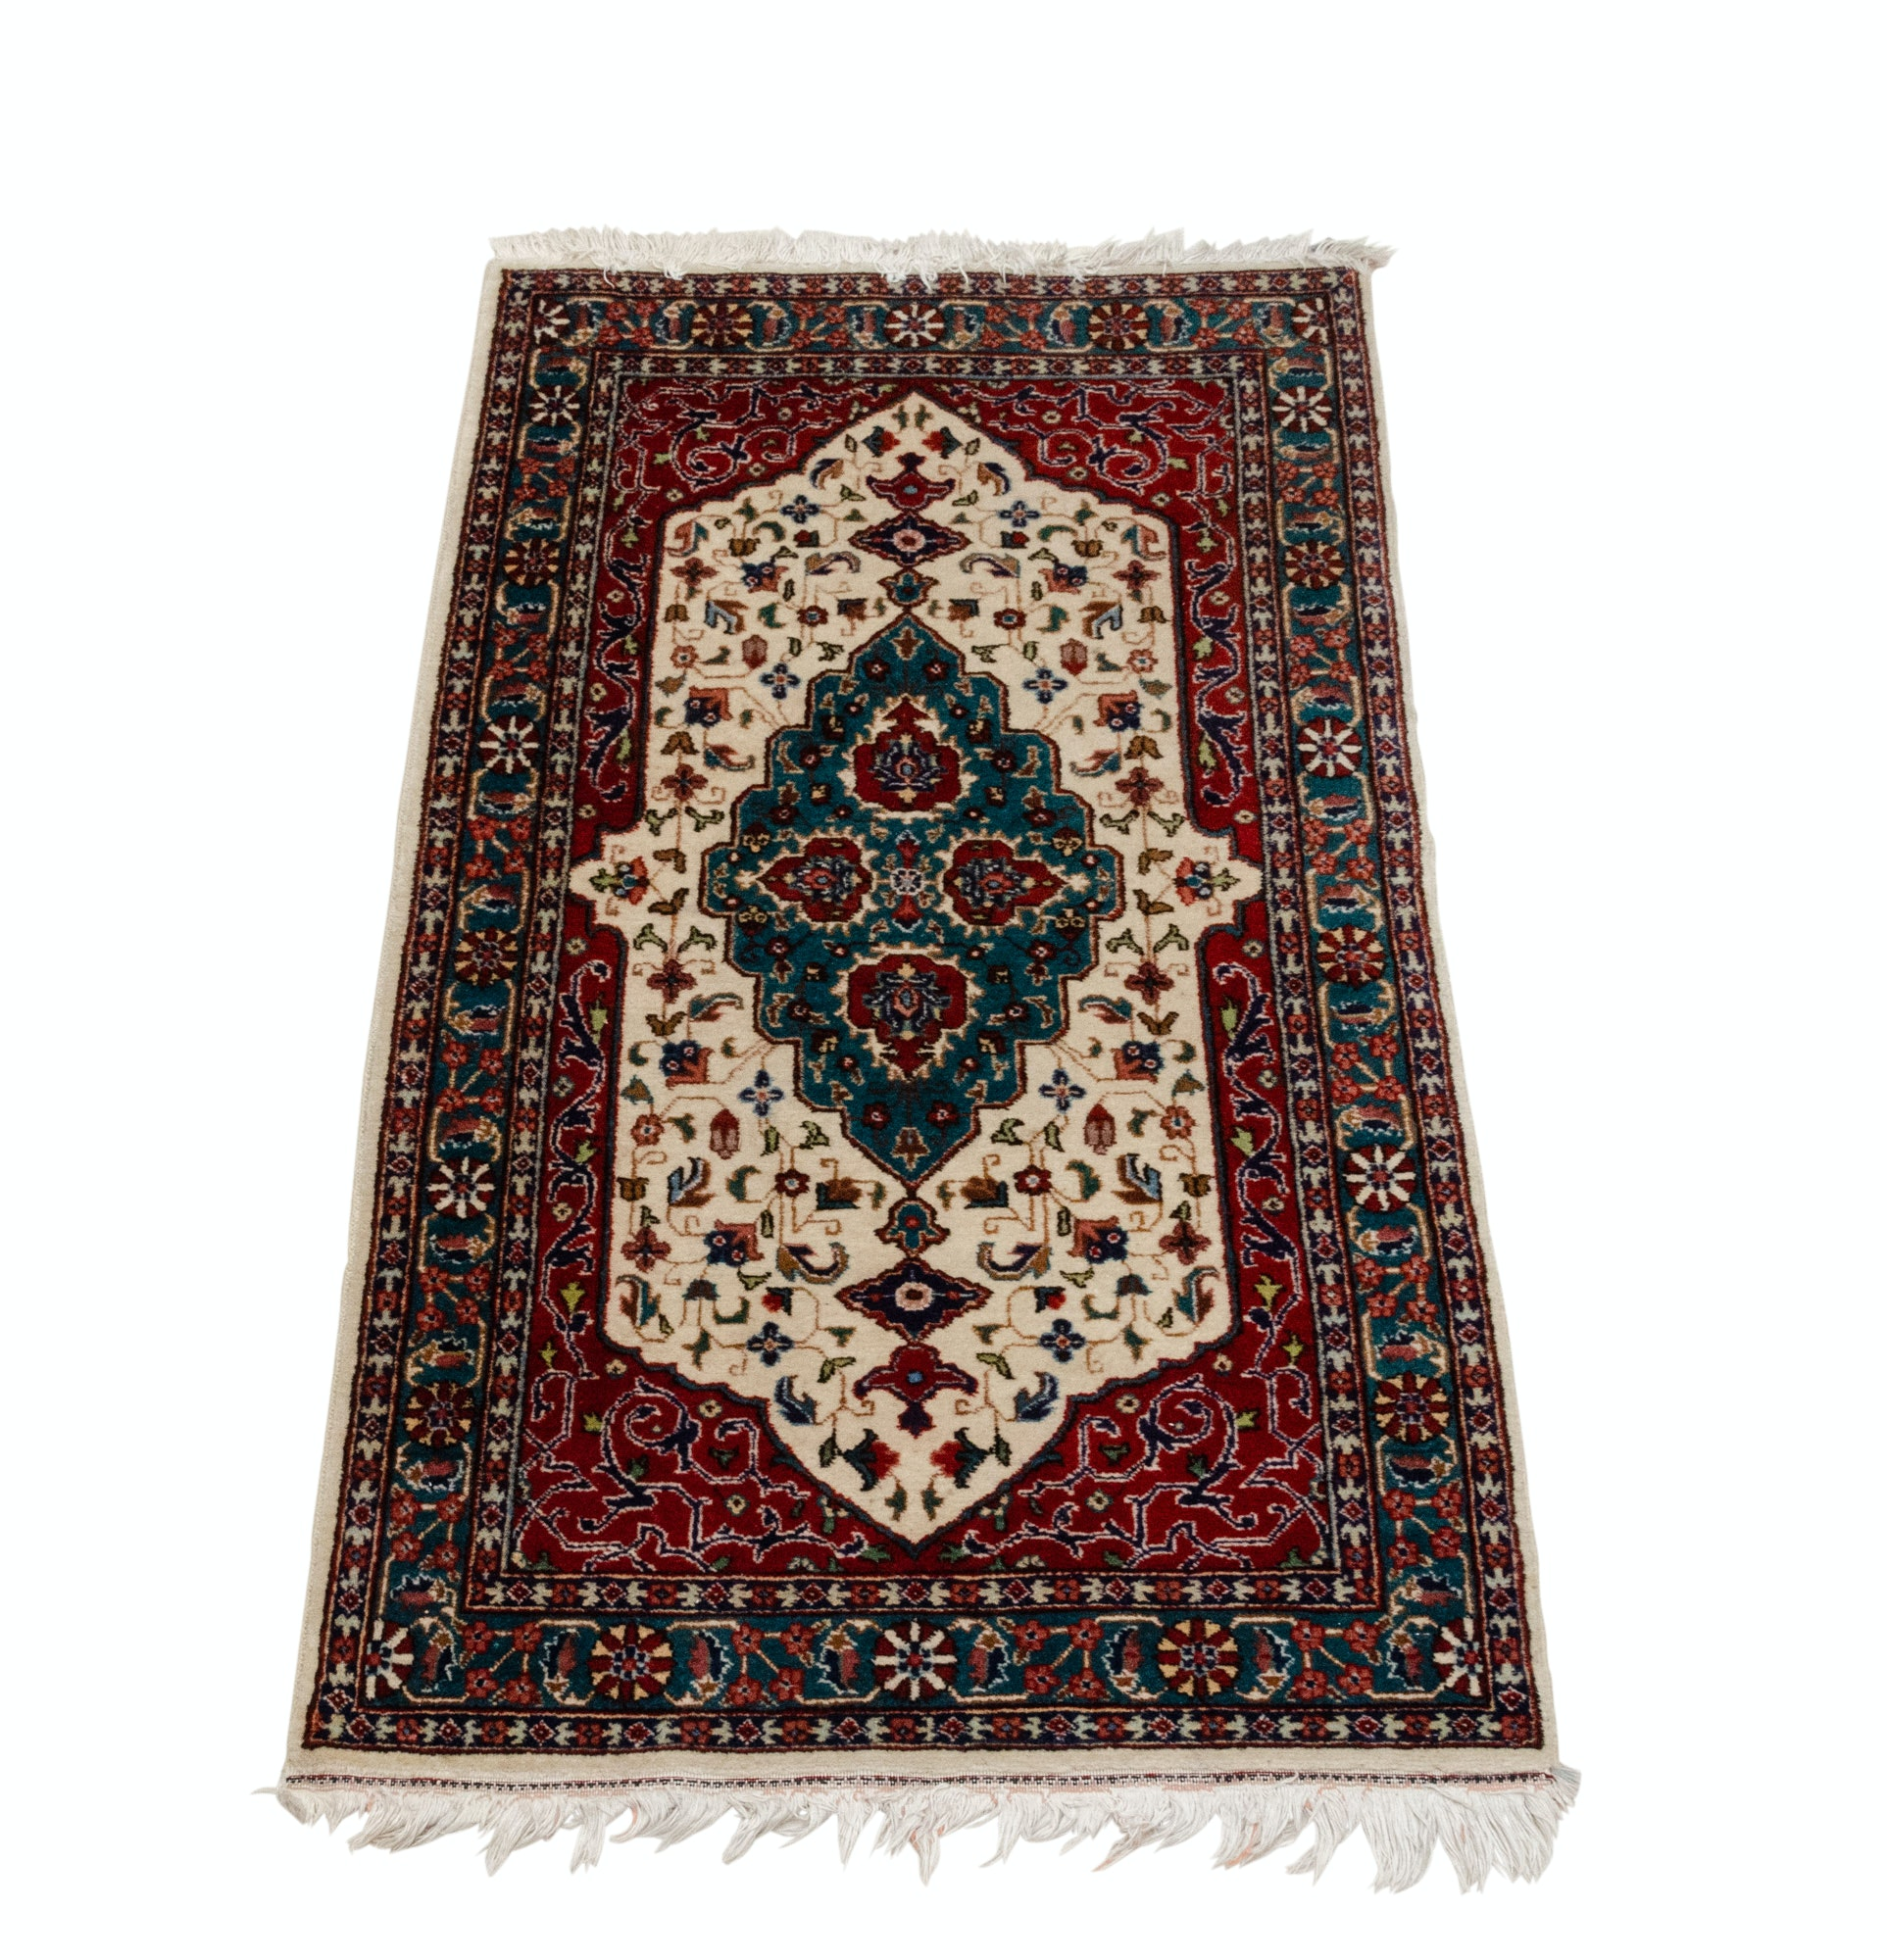 Hand-Knotted Persian Tabatabai Tabriz Wool Area Rug